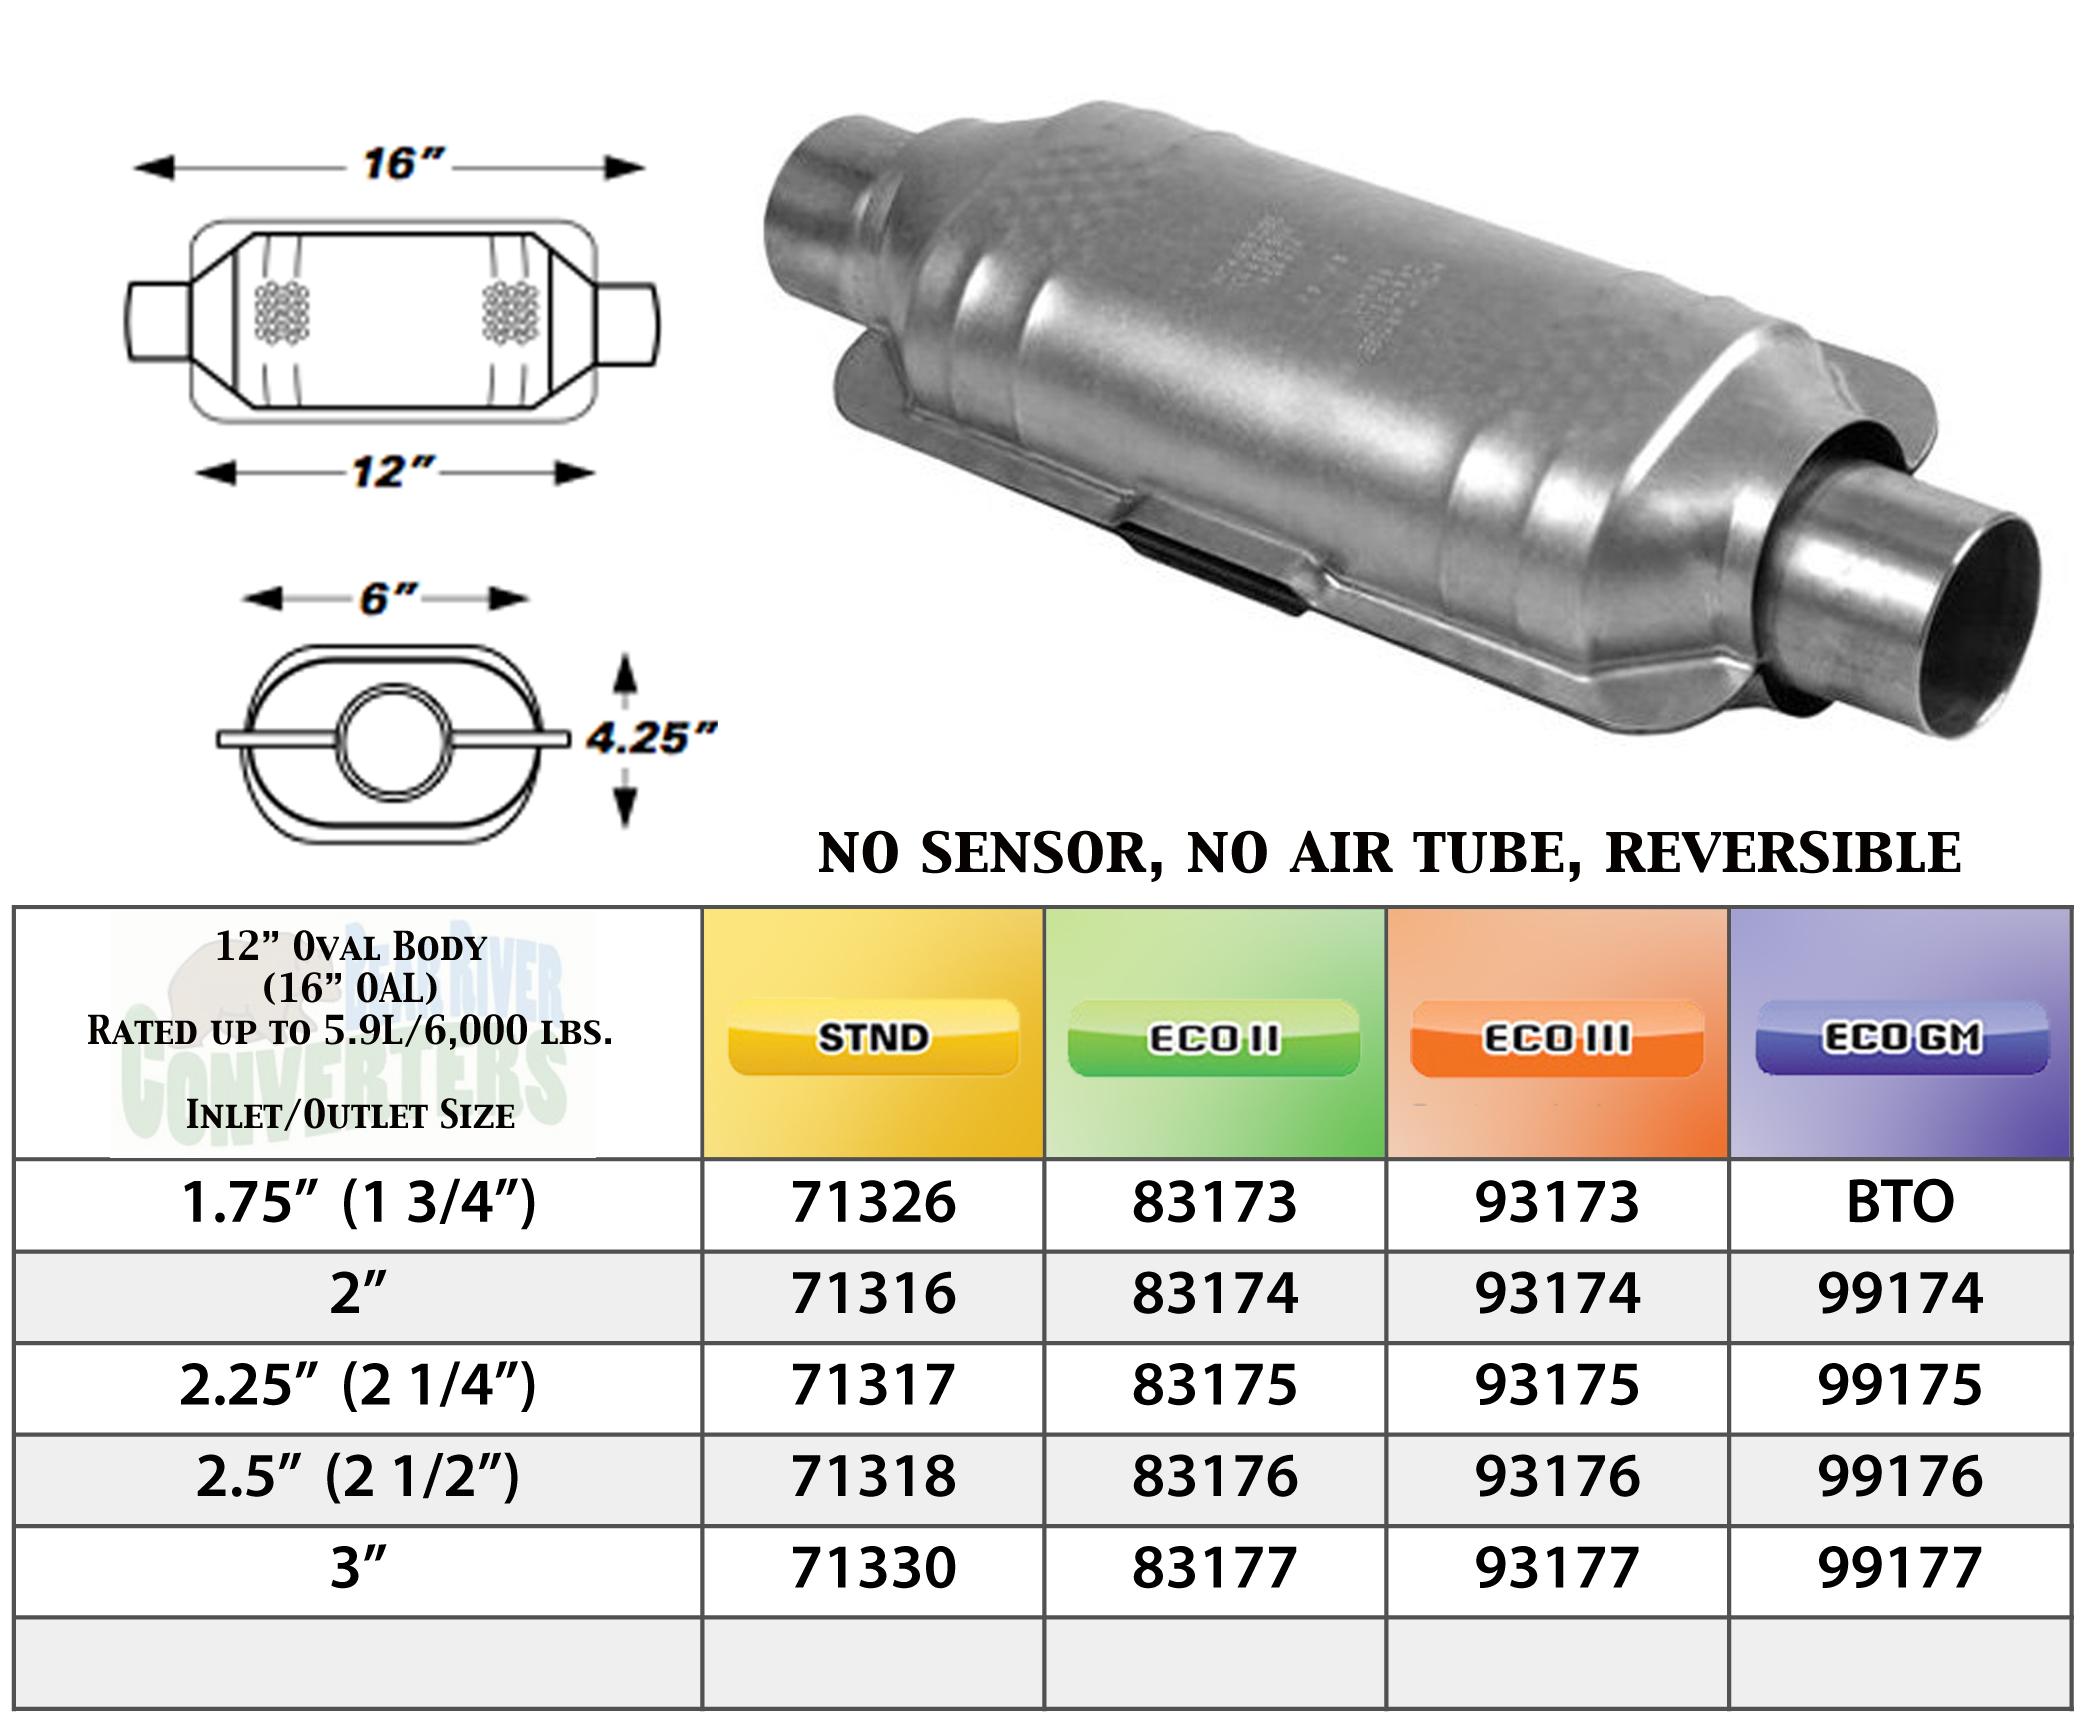 "71318 Eastern Universal Catalytic Converter Standard 2.5"" 2 1//2"" Pipe 12"" Body"